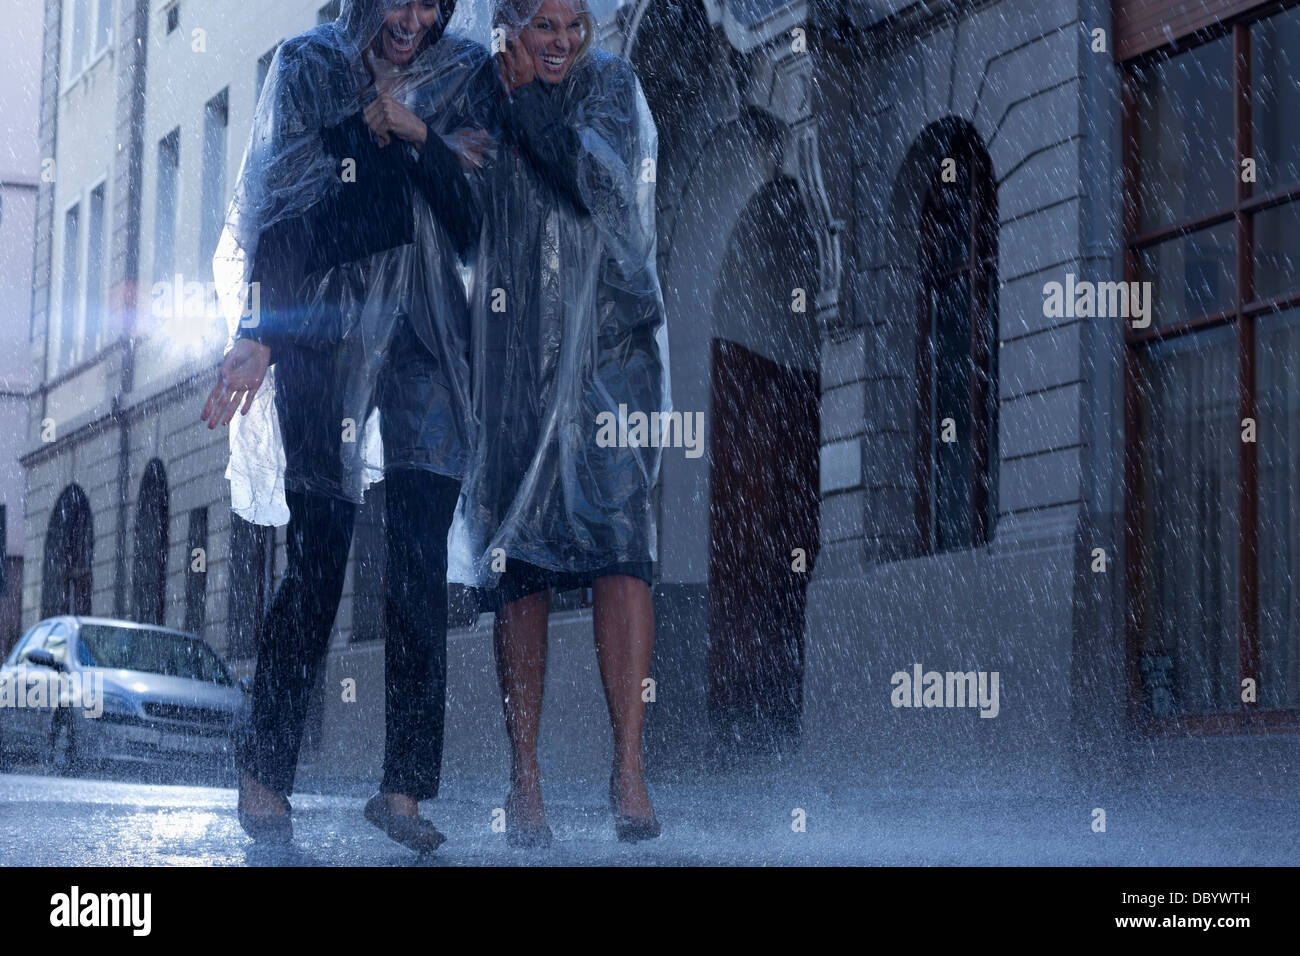 Businesswomen in ponchos walking in rainy street - Stock Image